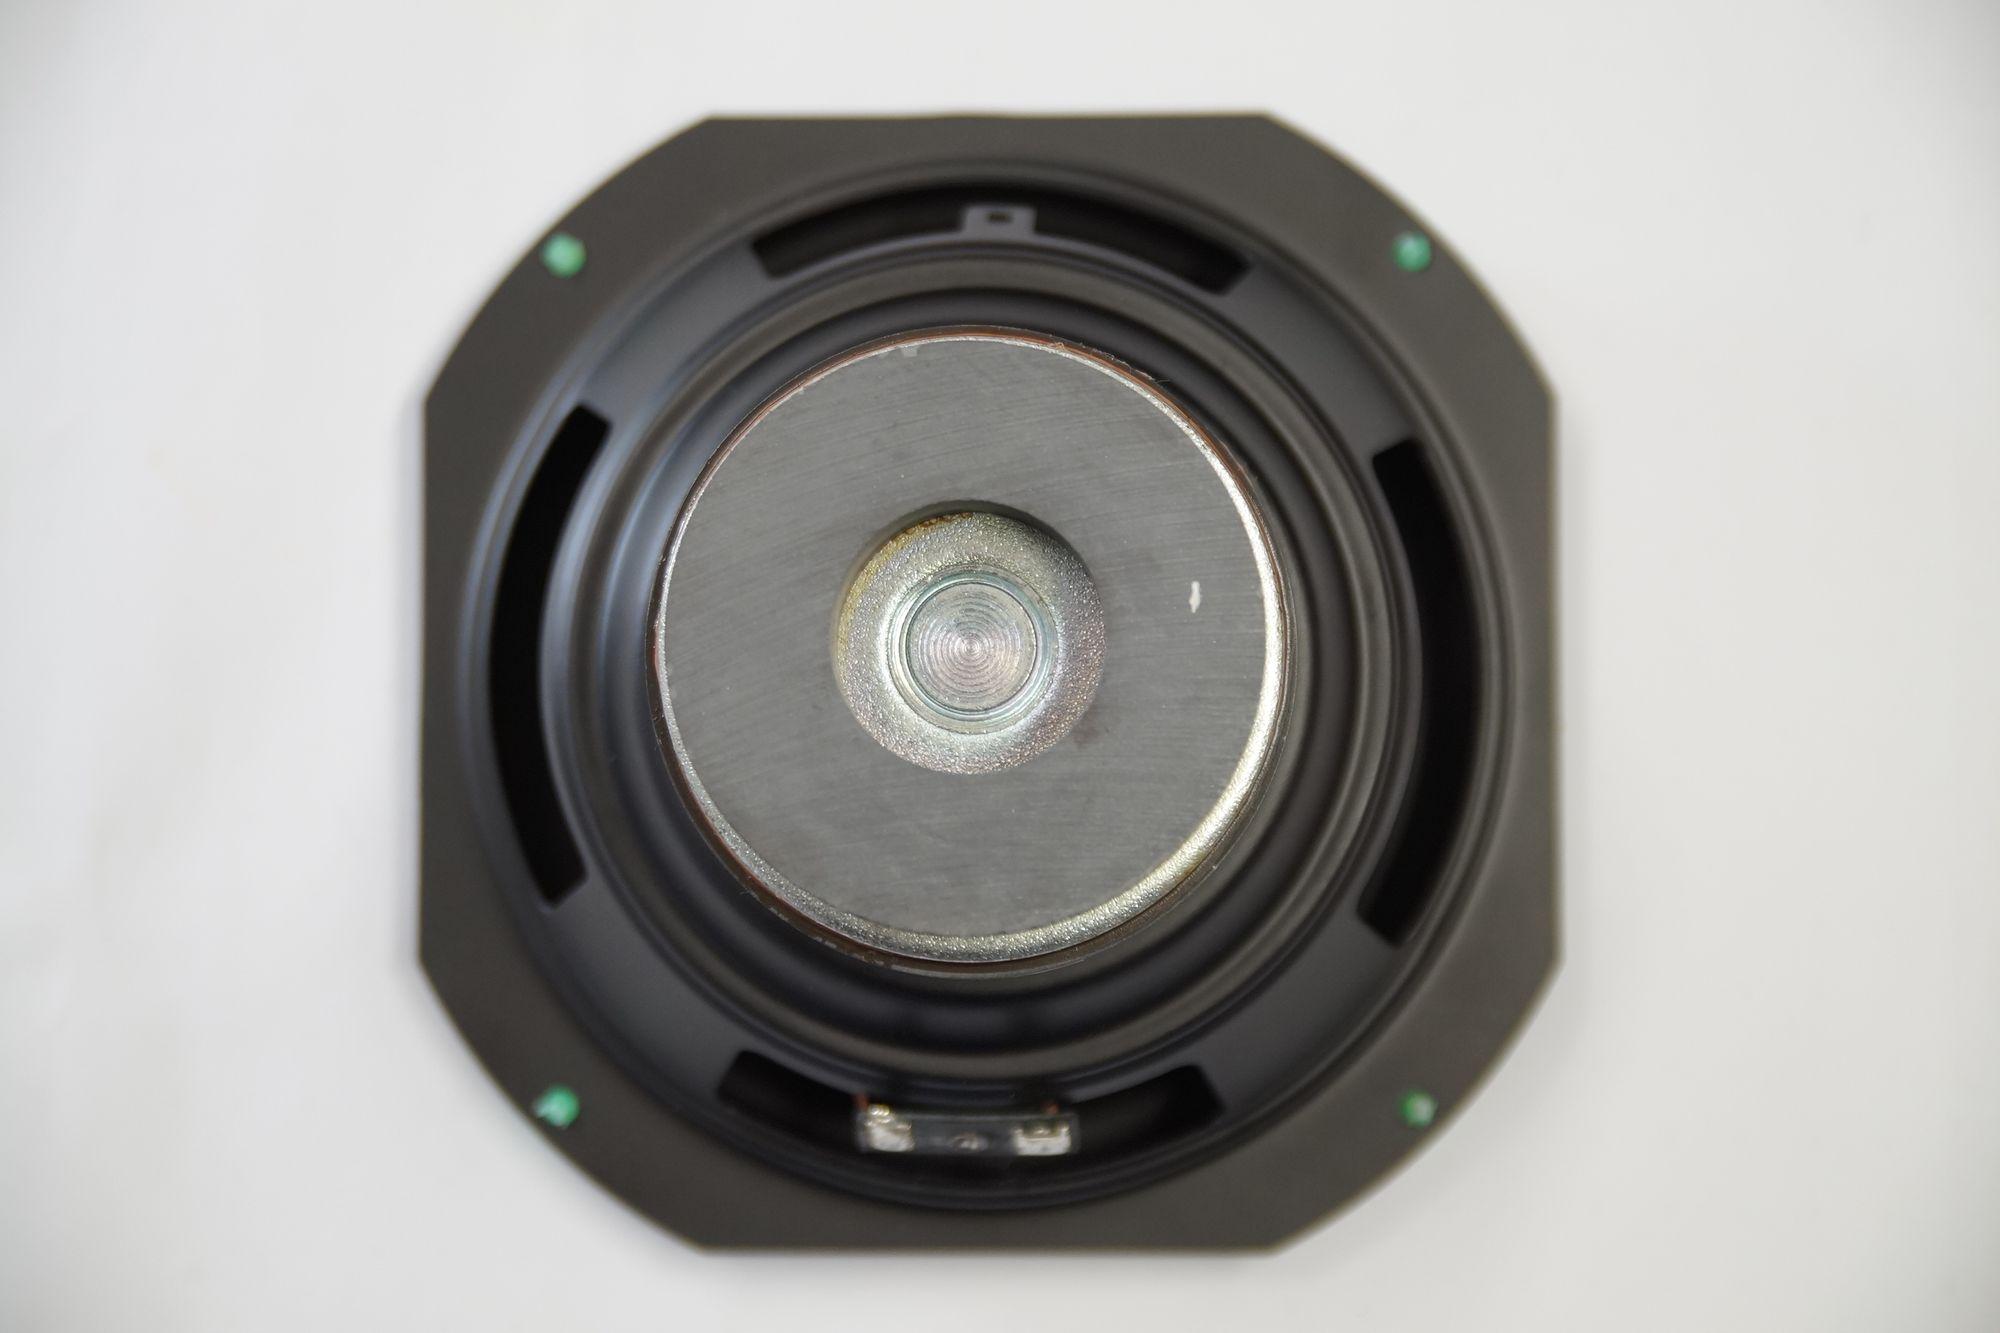 1 Stück 165 mm Tiefmitteltöner Heco Vitas  HW165 S-PP 480 D  – Bild 4